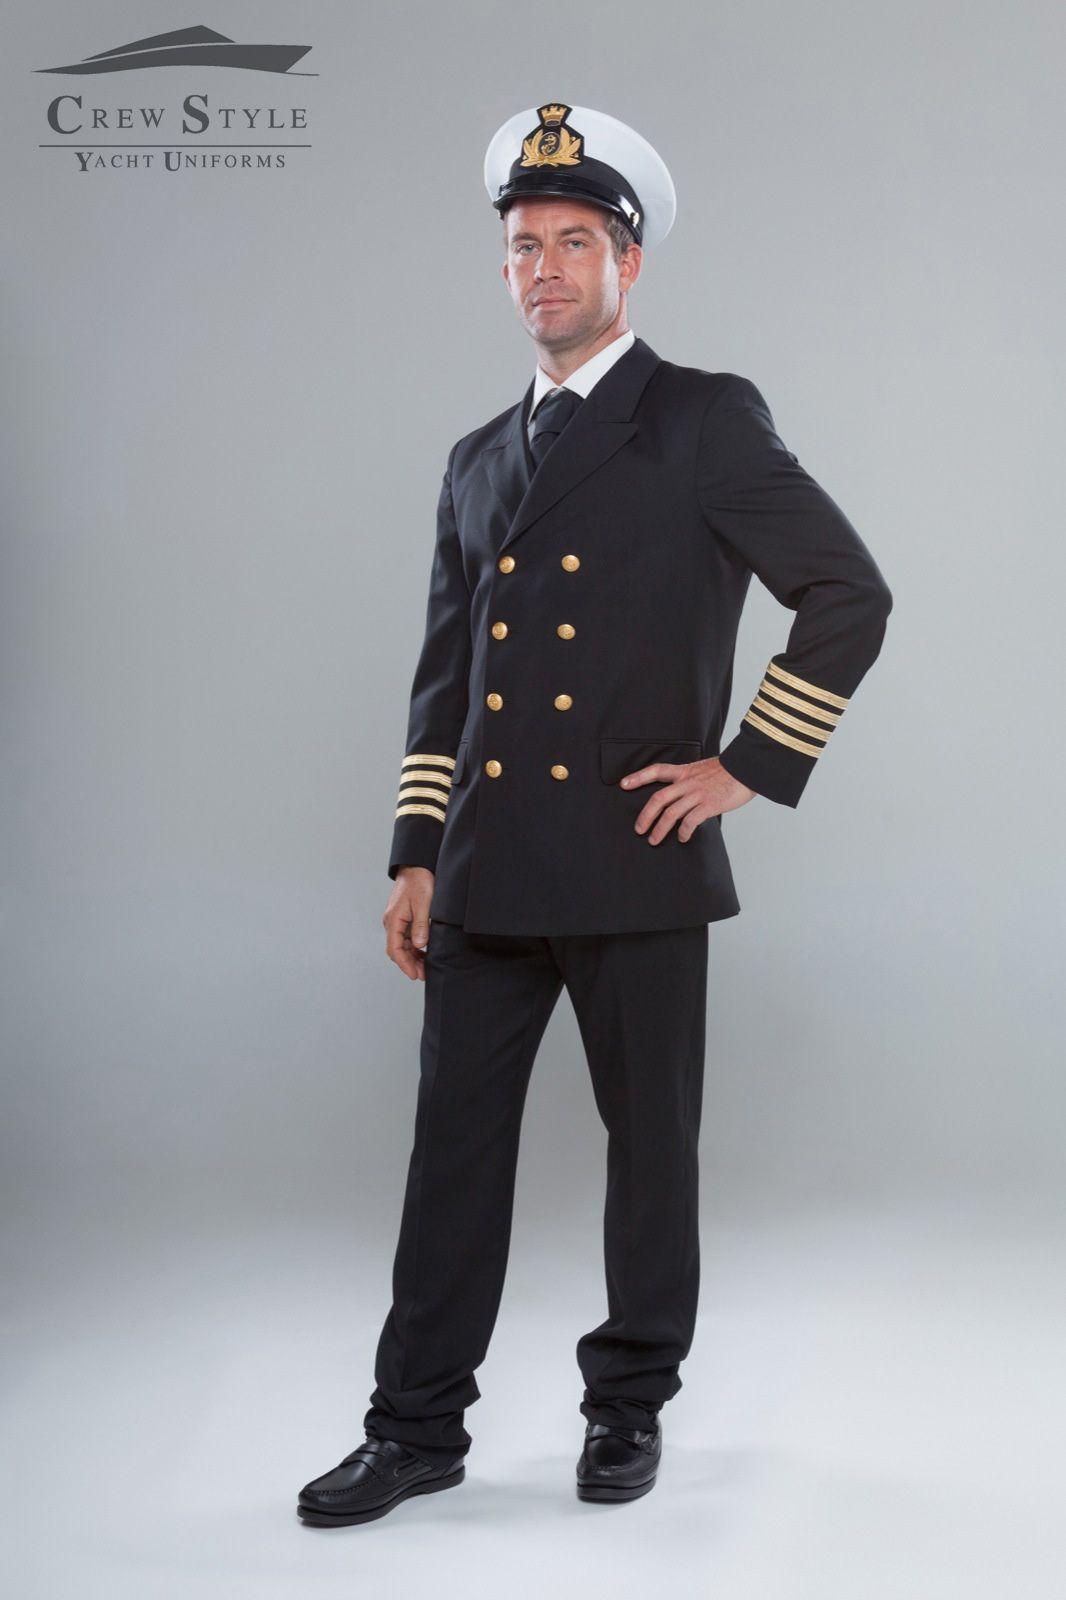 Captain uniform, yacht uniforms, yacht wear, www.crewstyle.it